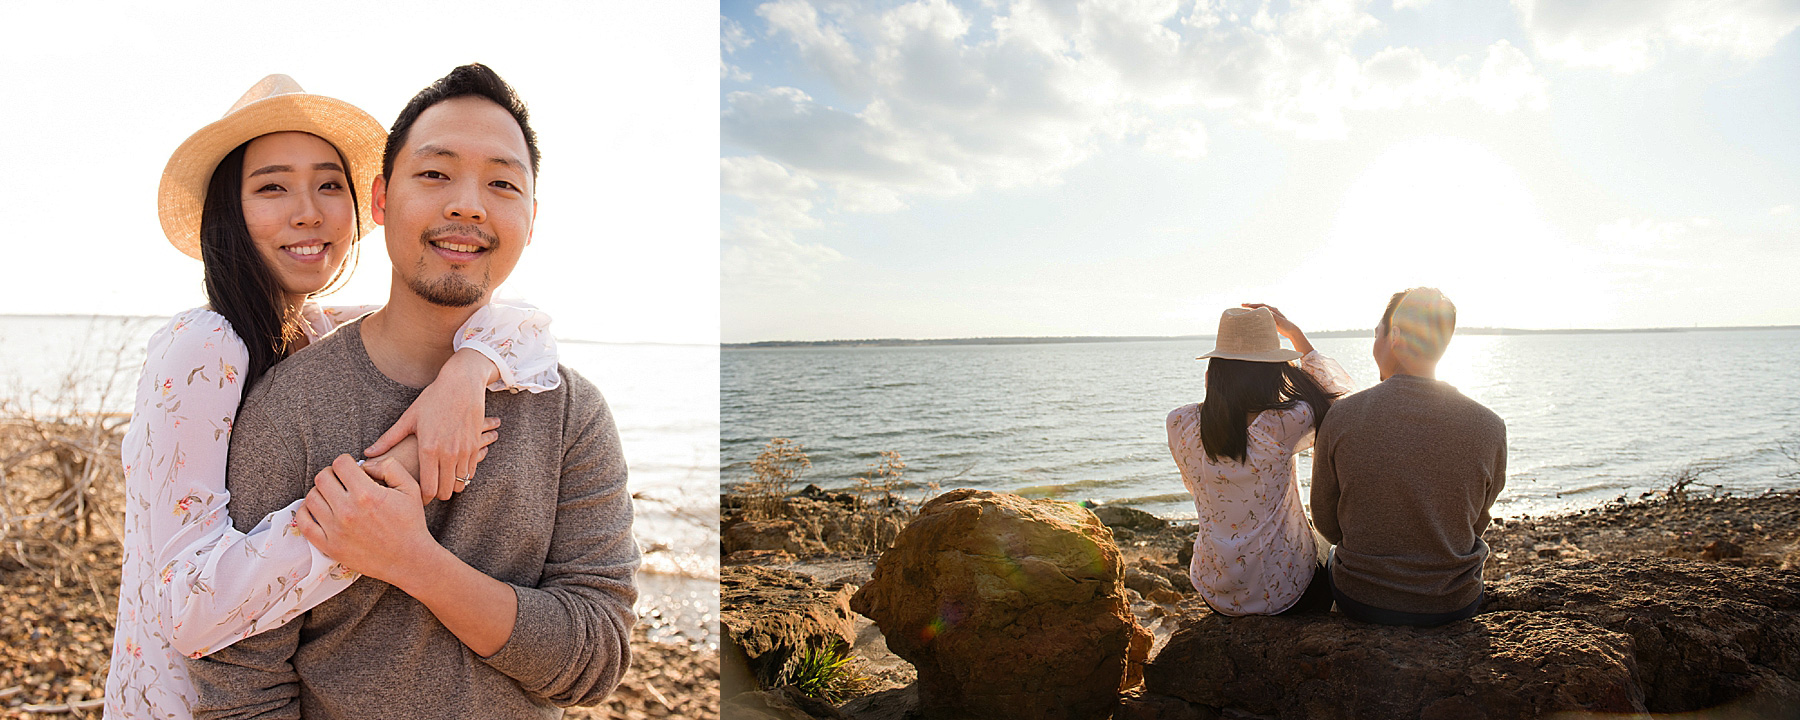 happy-couple-beach-lifestyle-lake-grapevine_0041.jpg